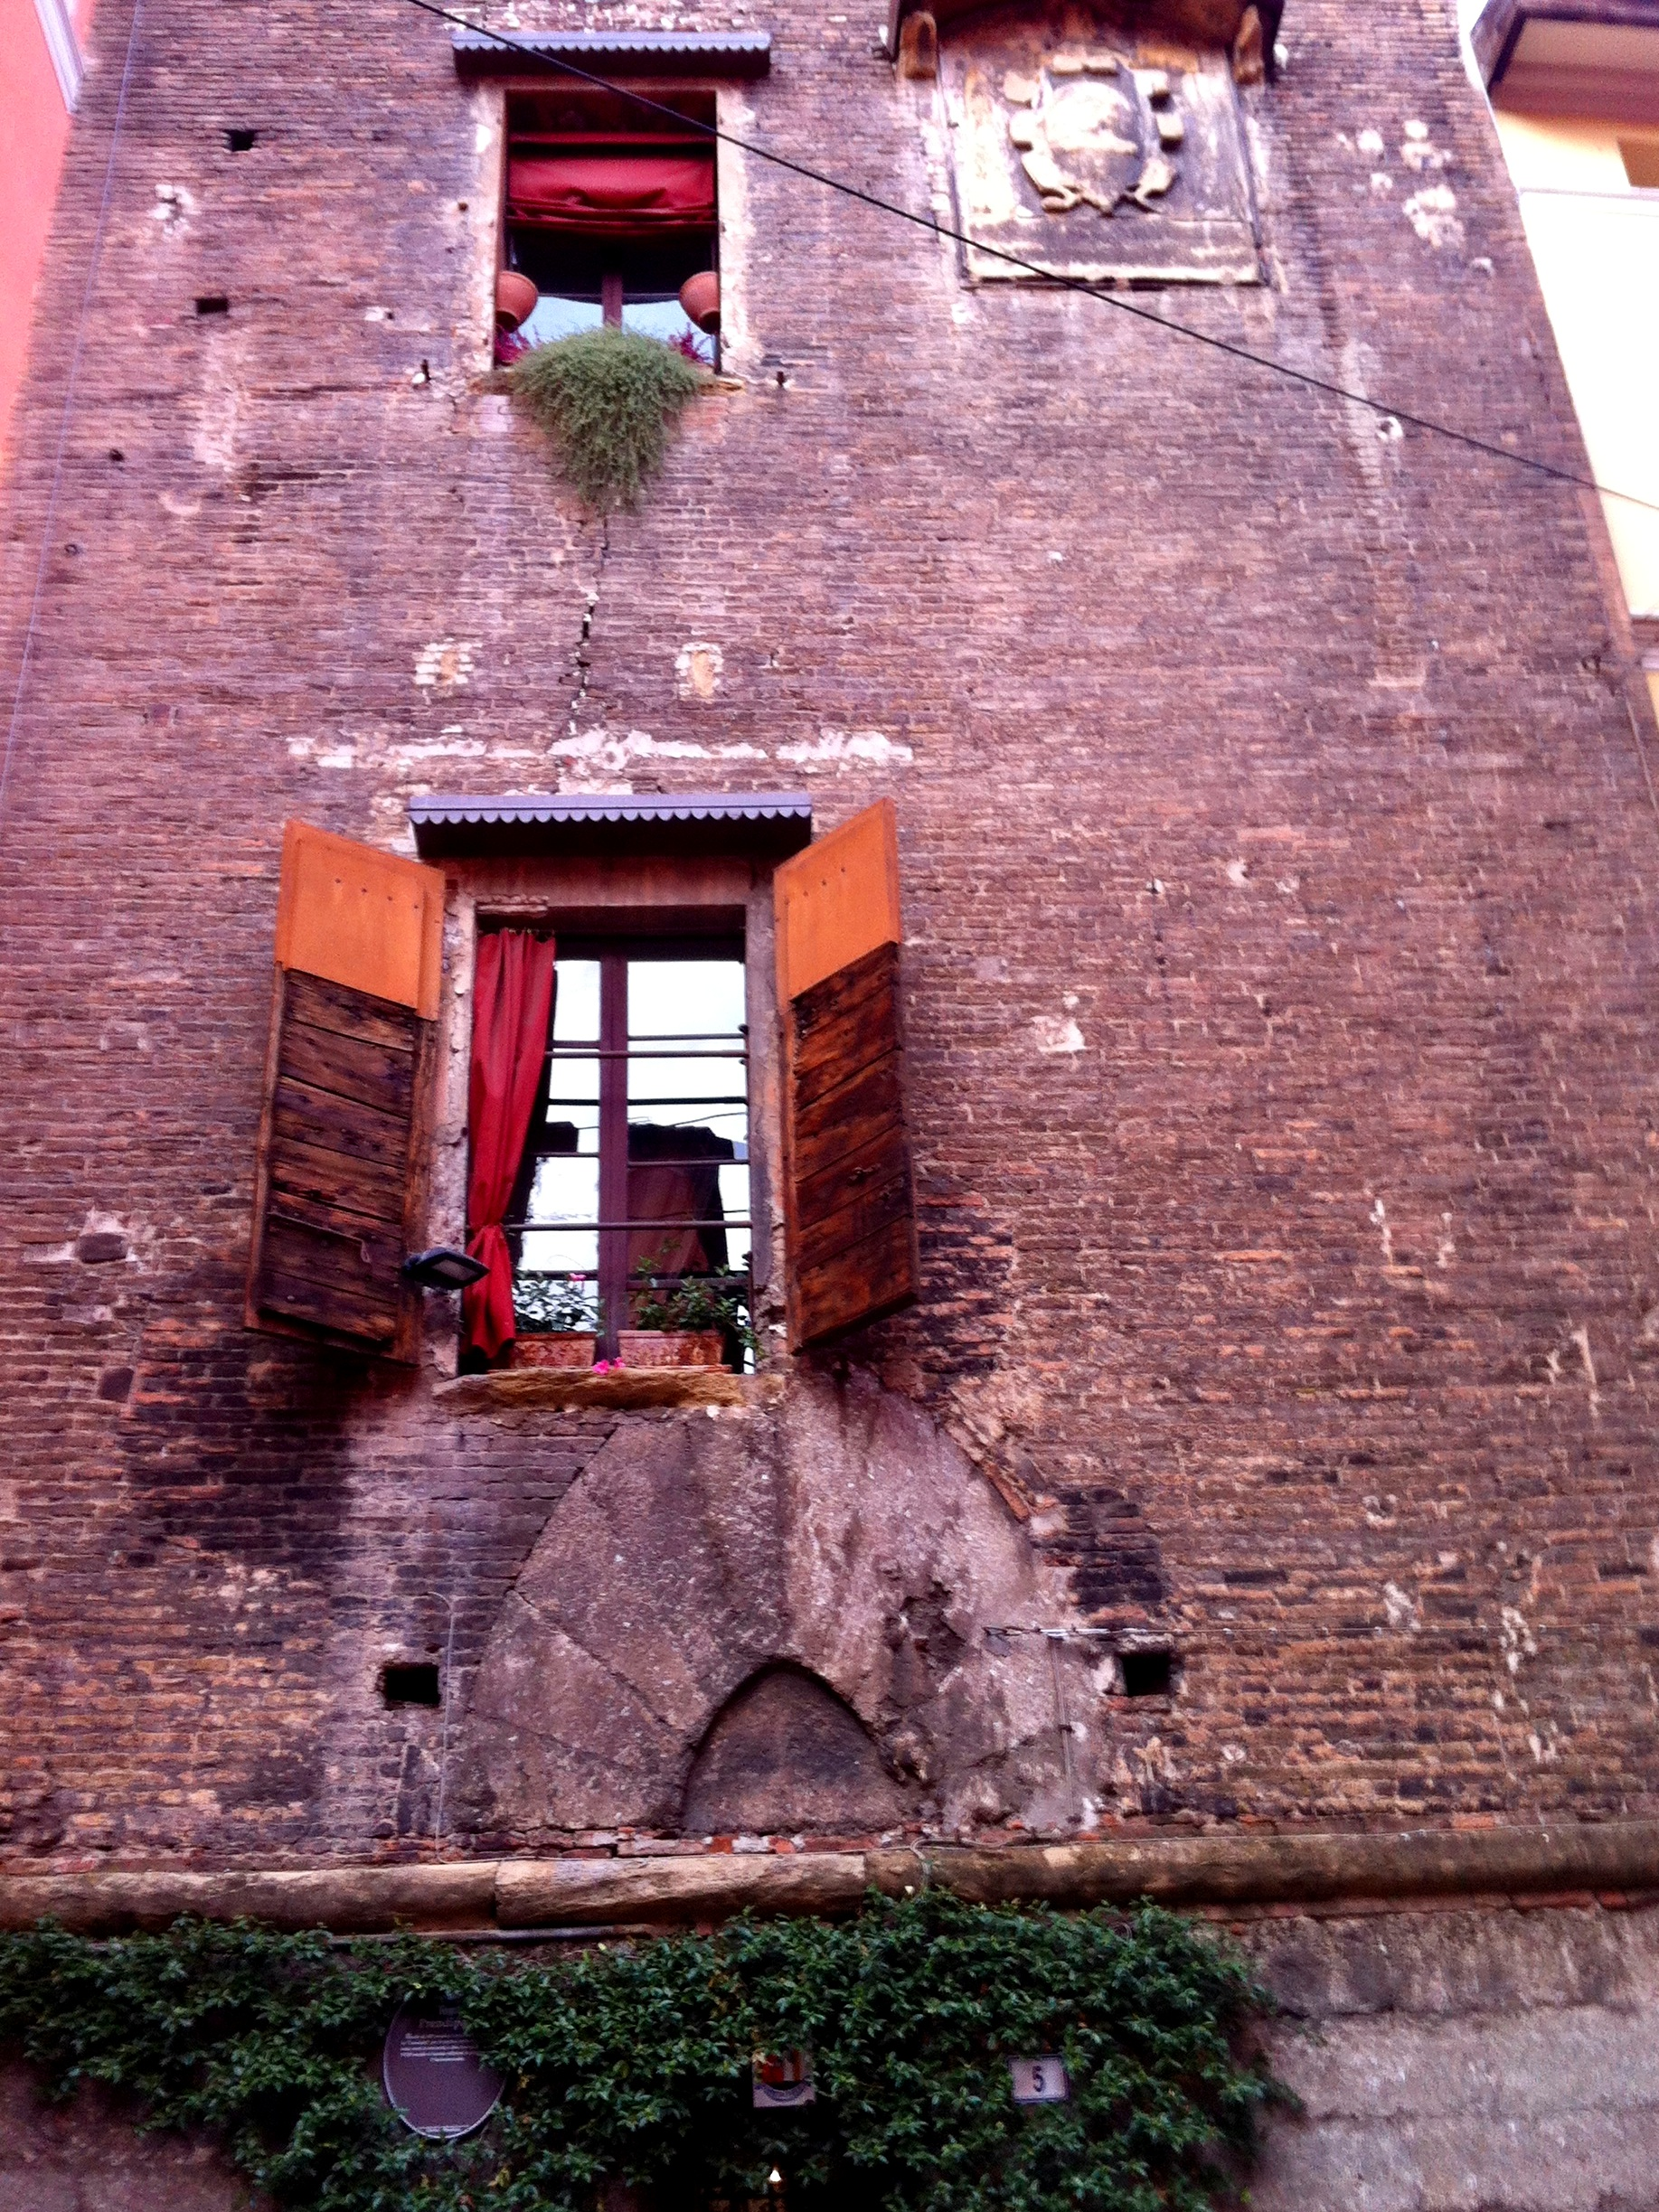 The ancient Prendiparte tower - Bologna